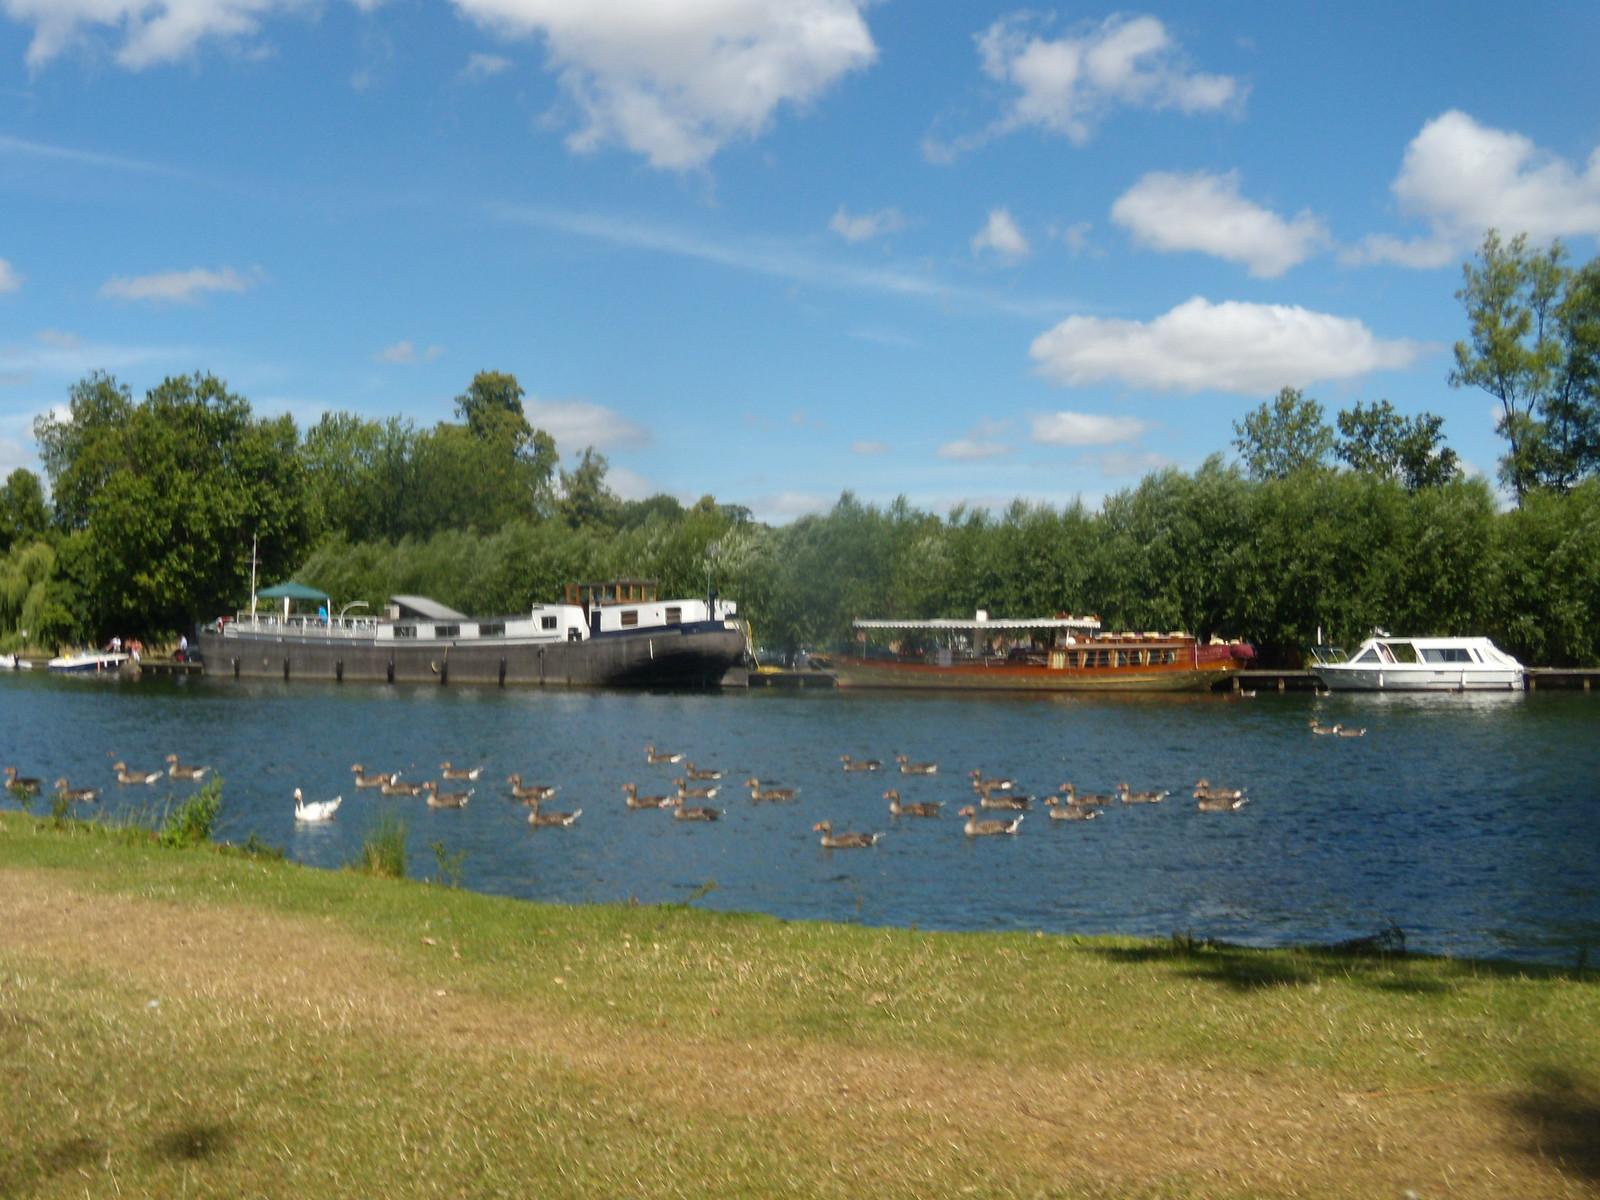 Flotilla of ducks Marlow Circular